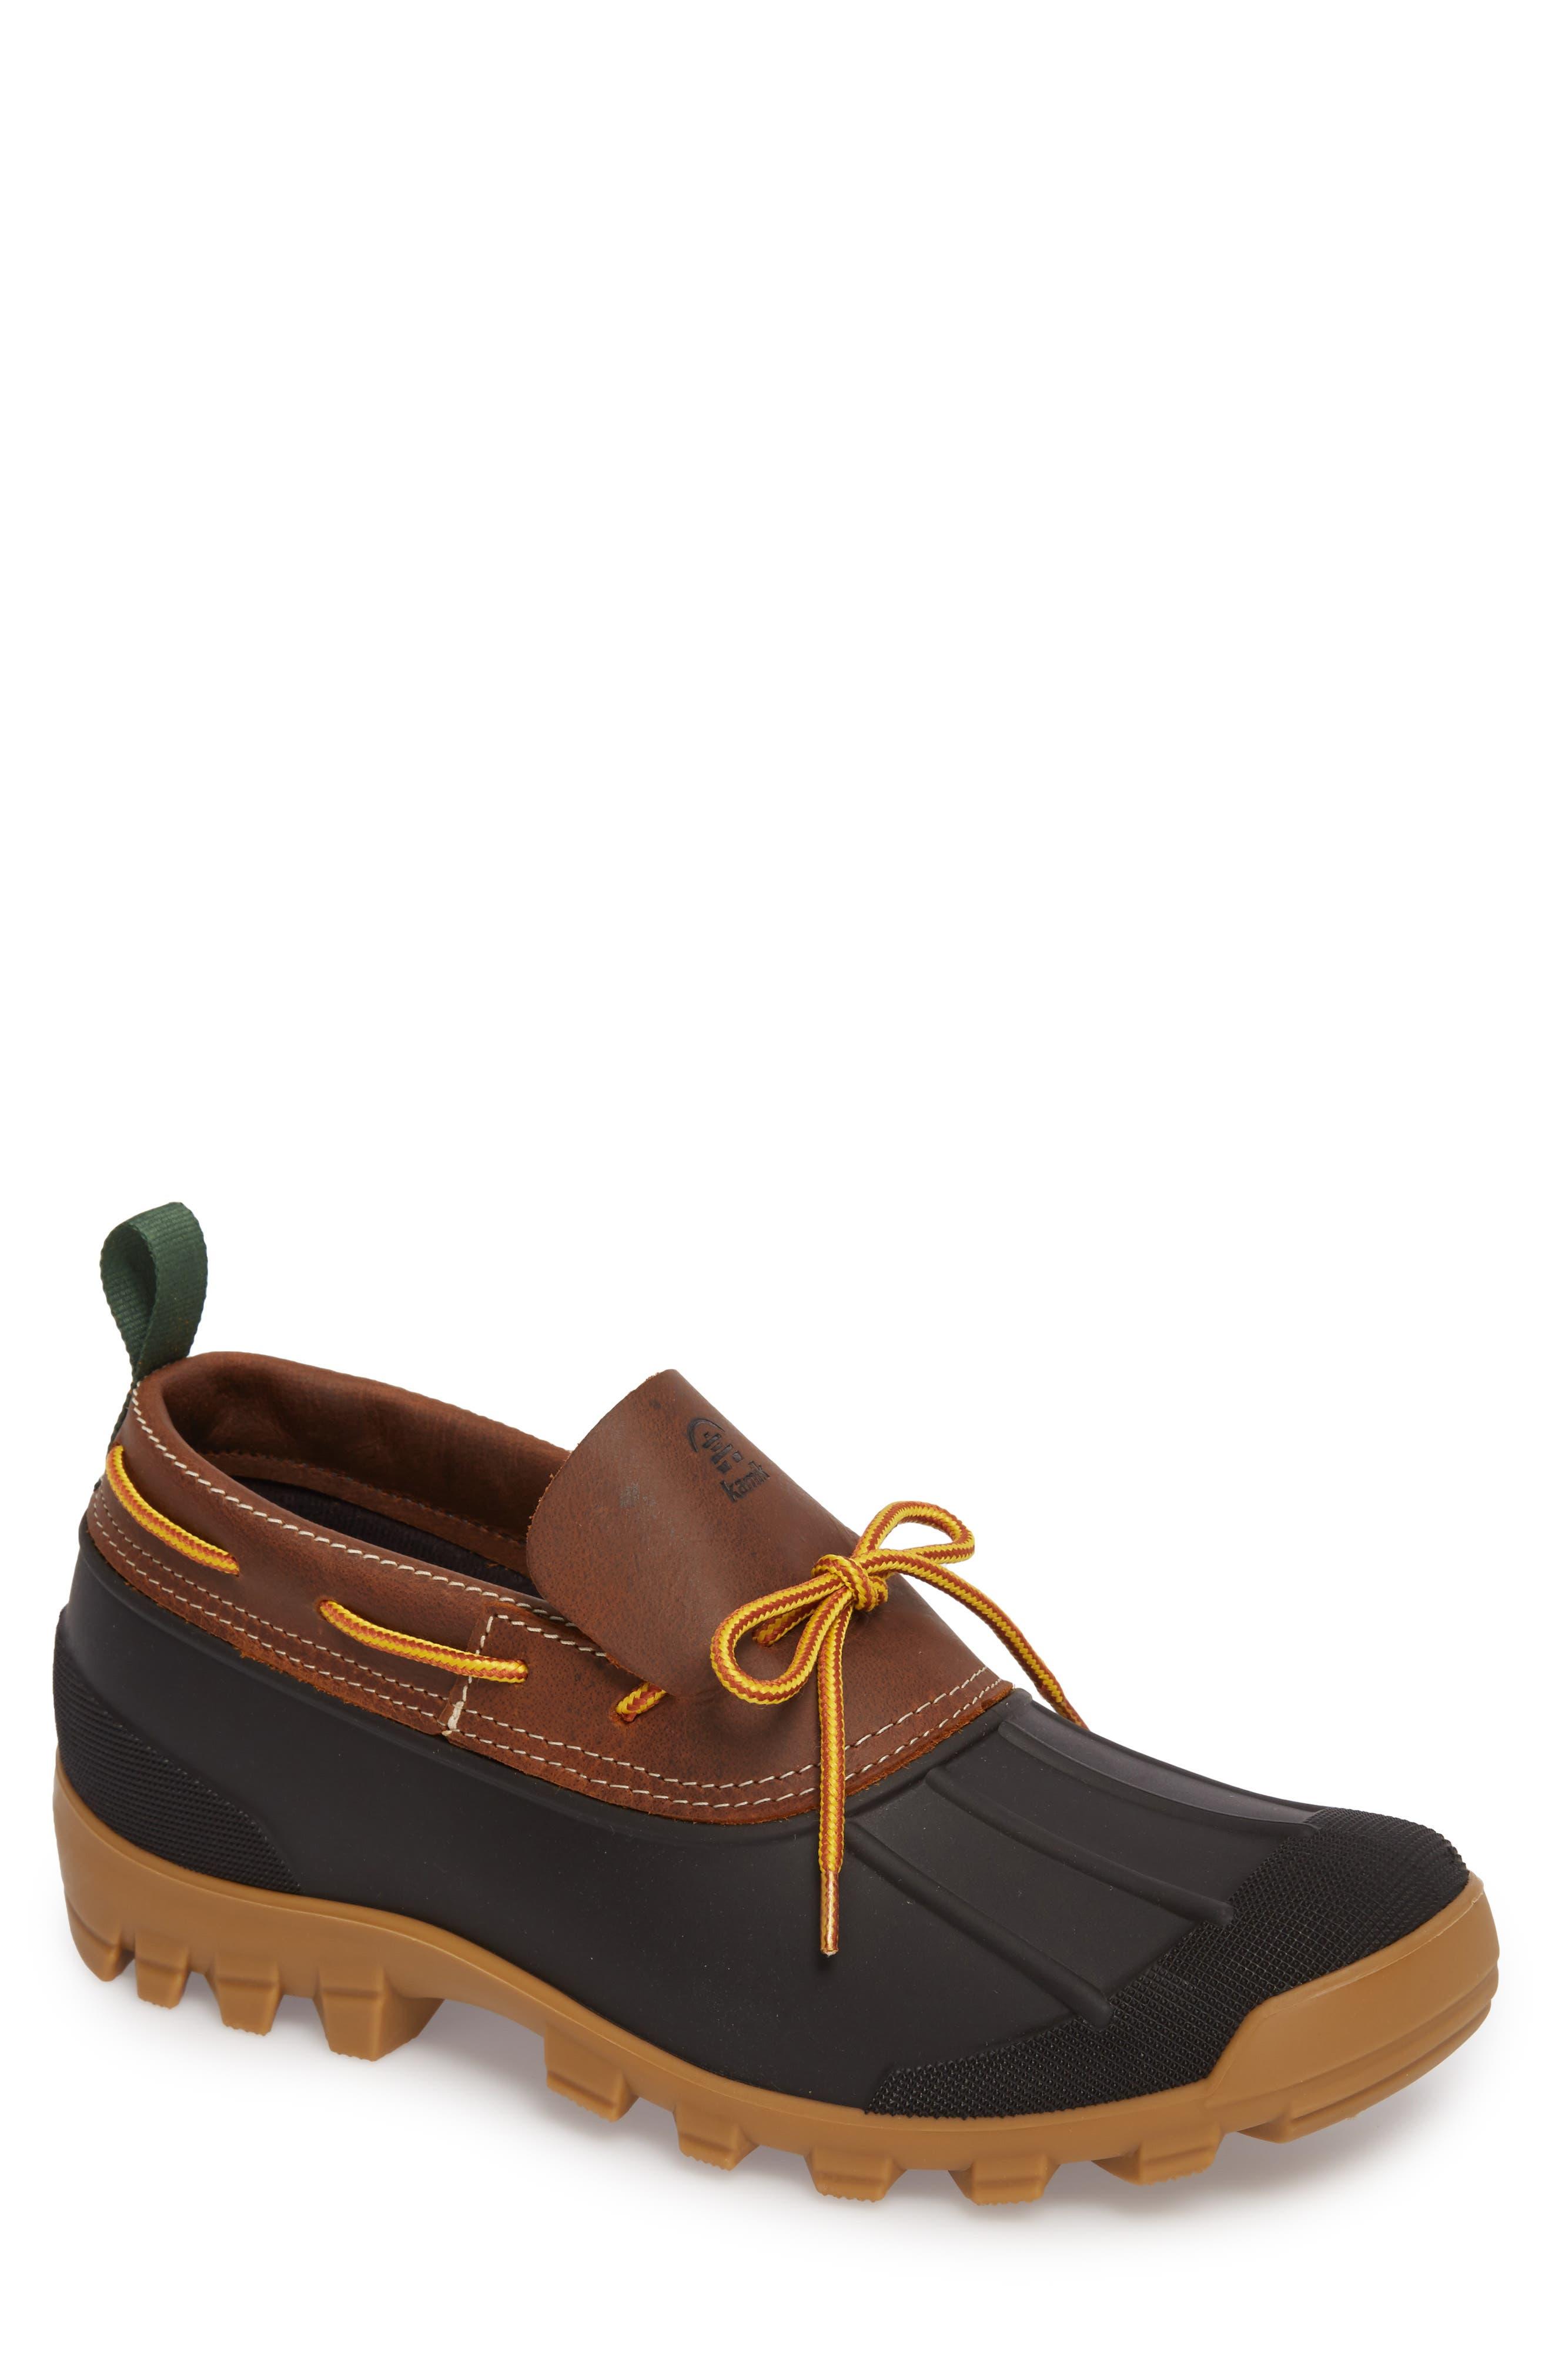 Alternate Image 1 Selected - Kamik Yukon Short Boot (Men)